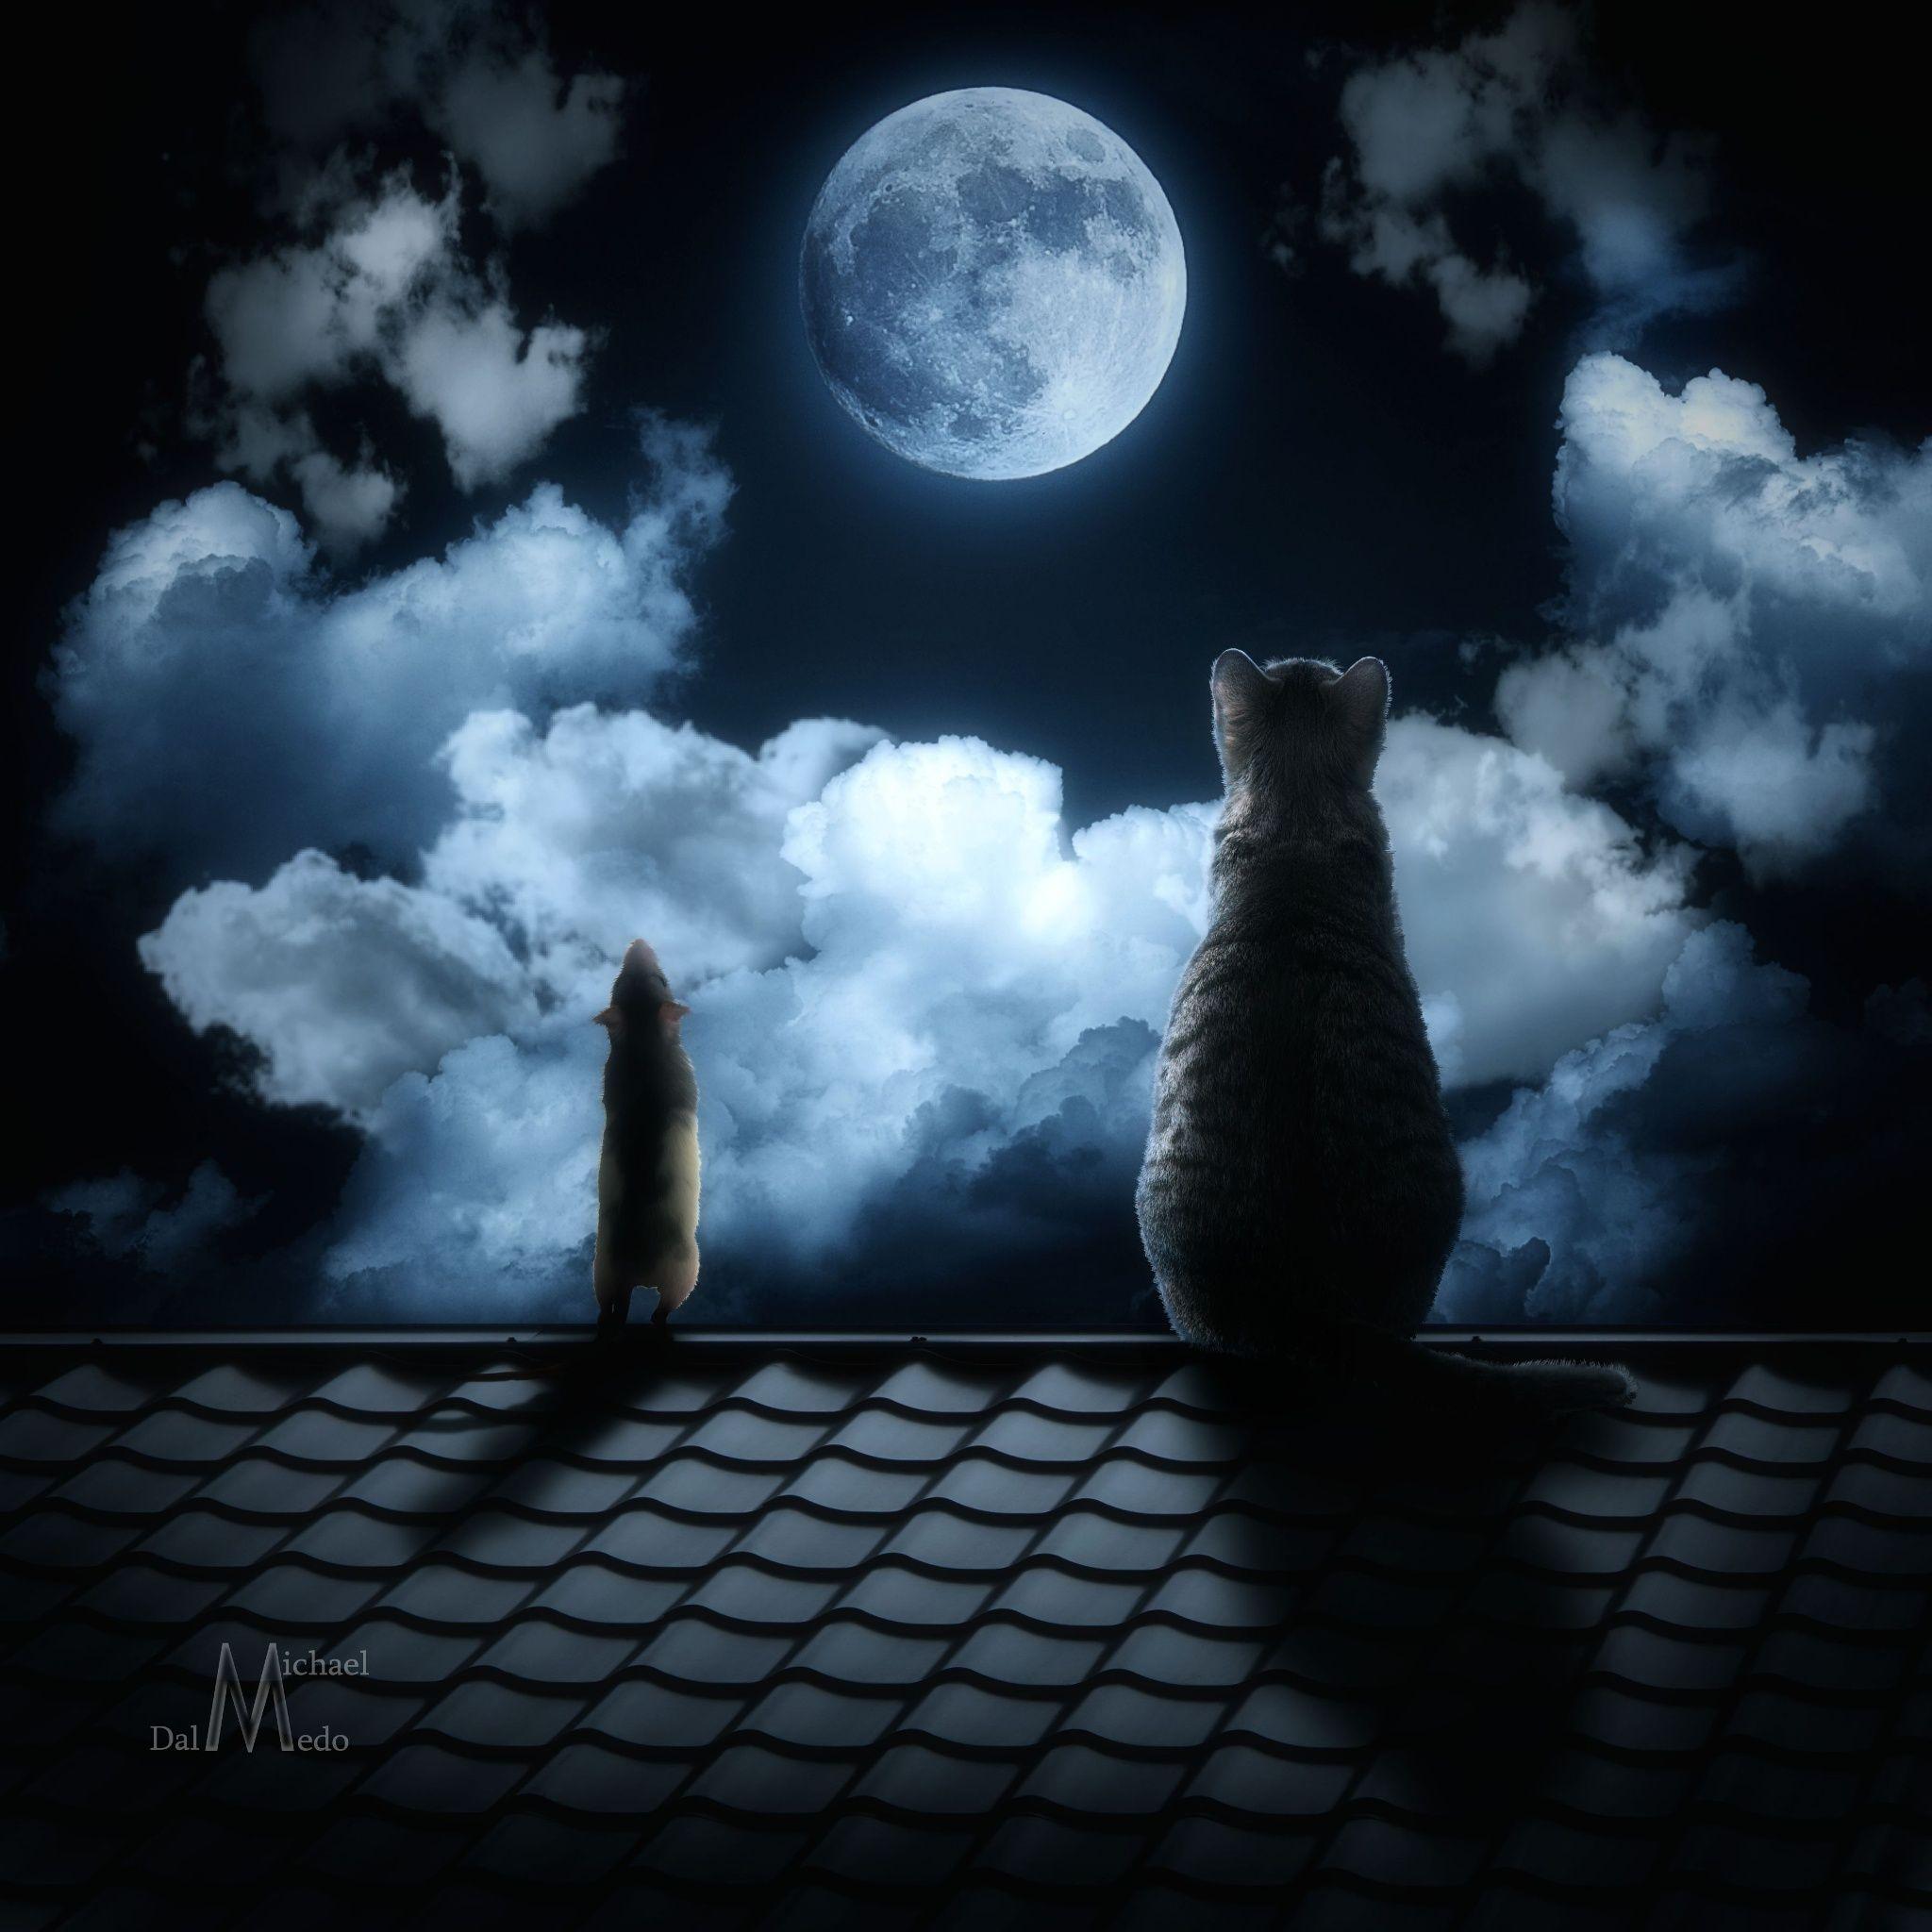 картинки ночь крыша луна расскажем